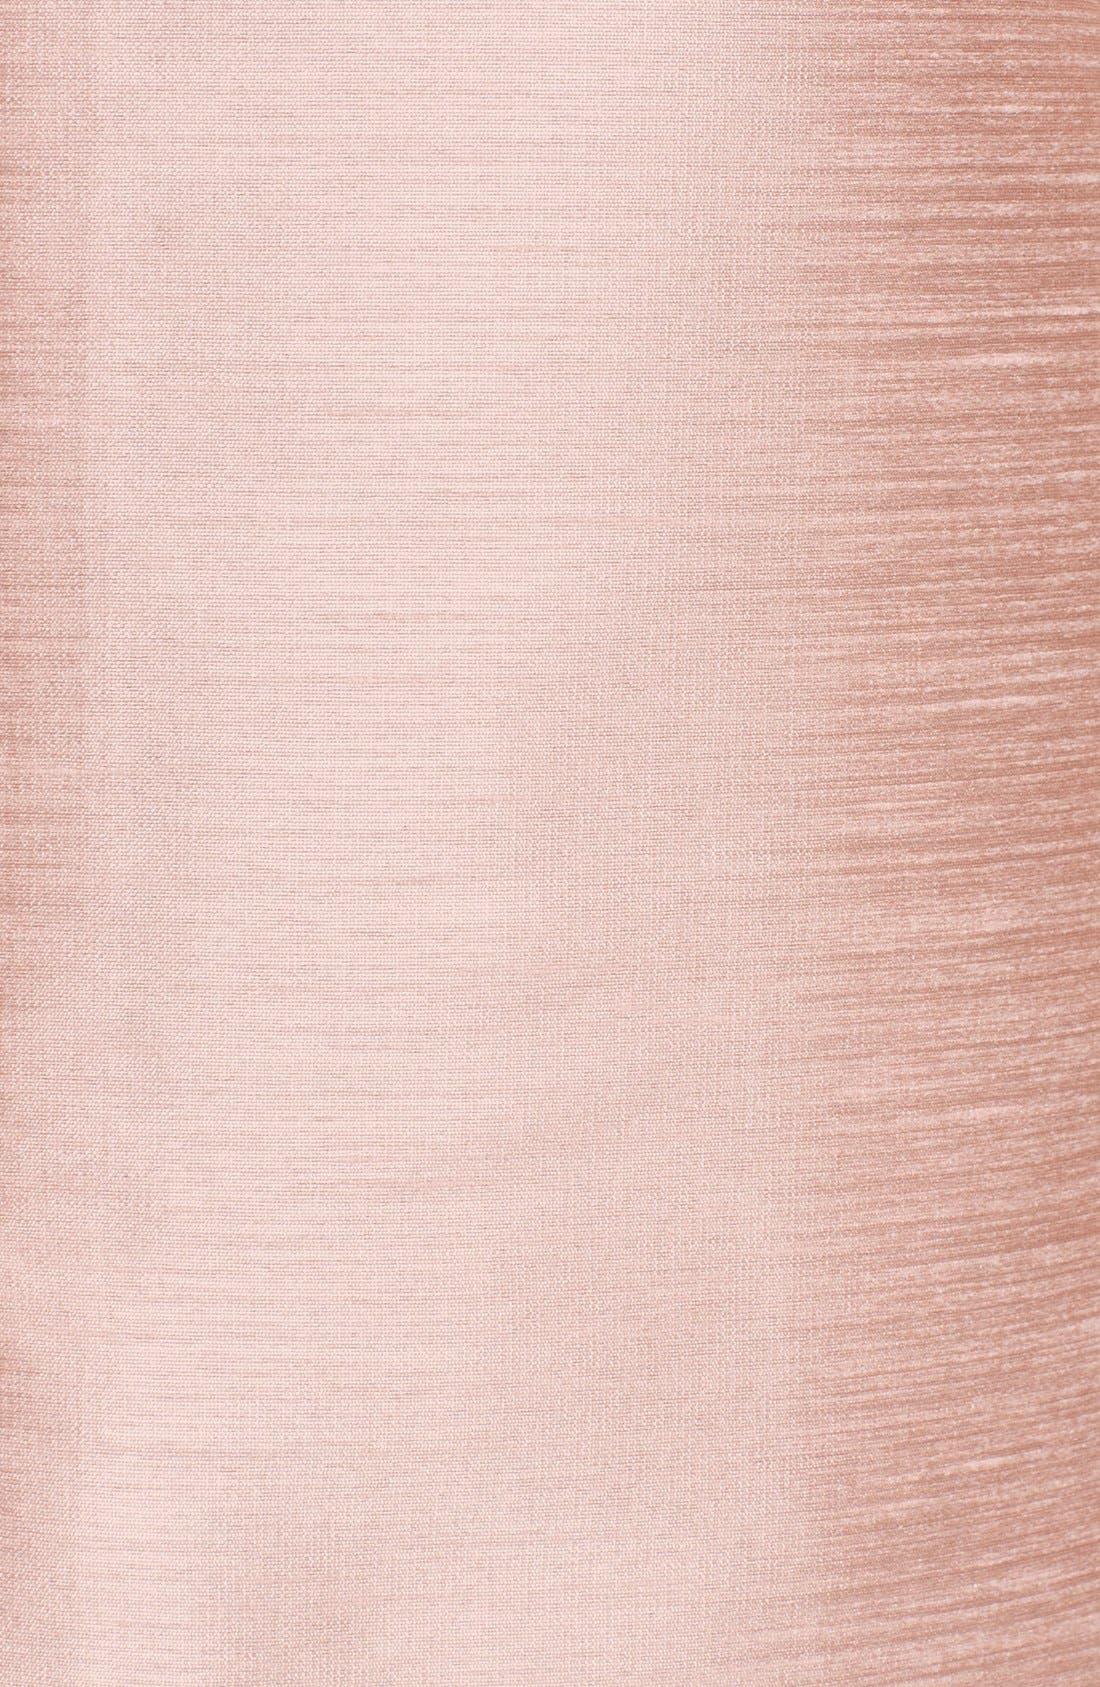 Boatneck Sheath Dress,                             Alternate thumbnail 10, color,                             689